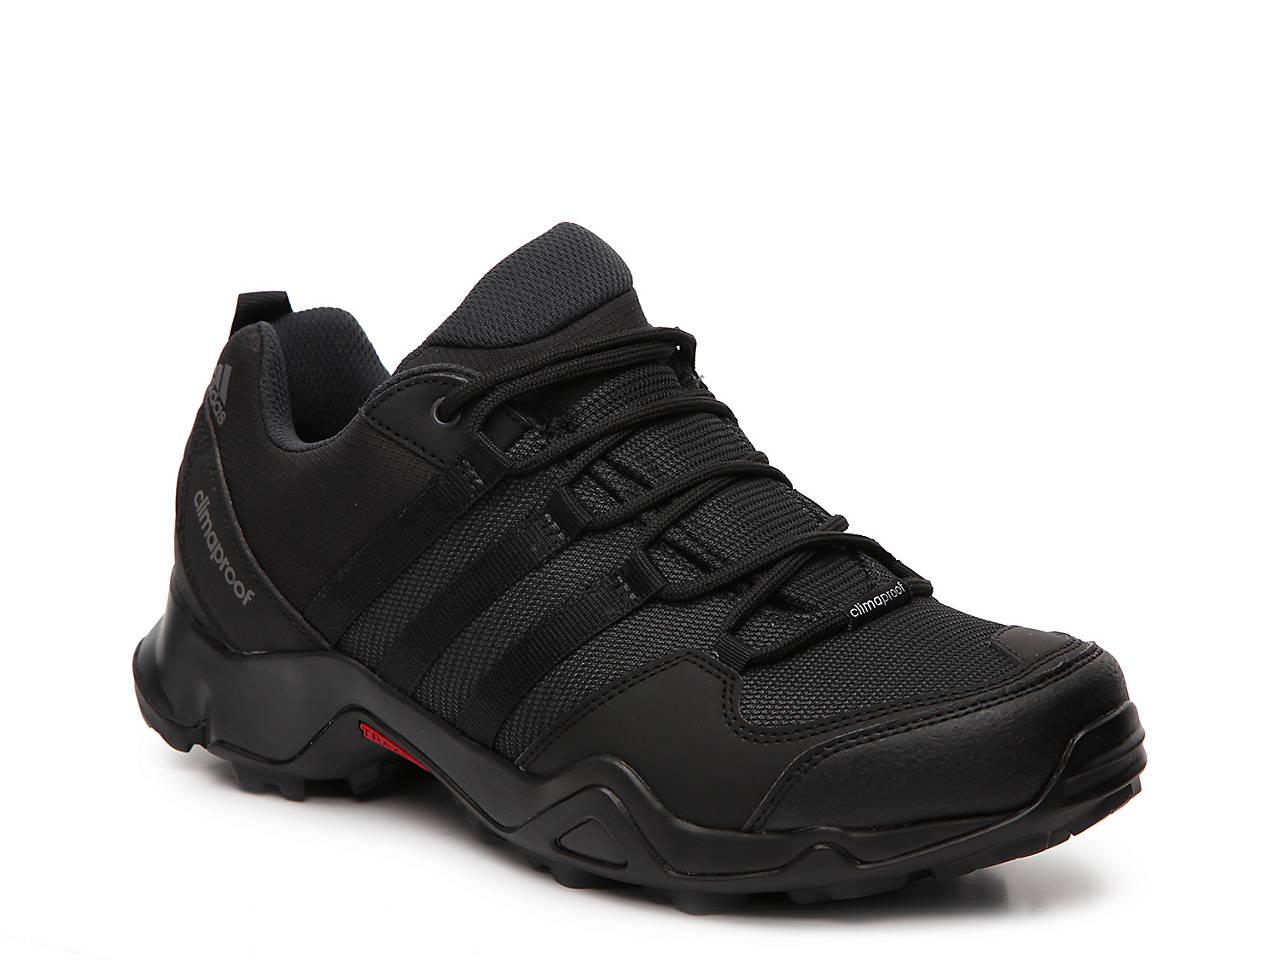 online retailer 32641 43e88 adidas. Terrex AX2 CP Trail Shoe